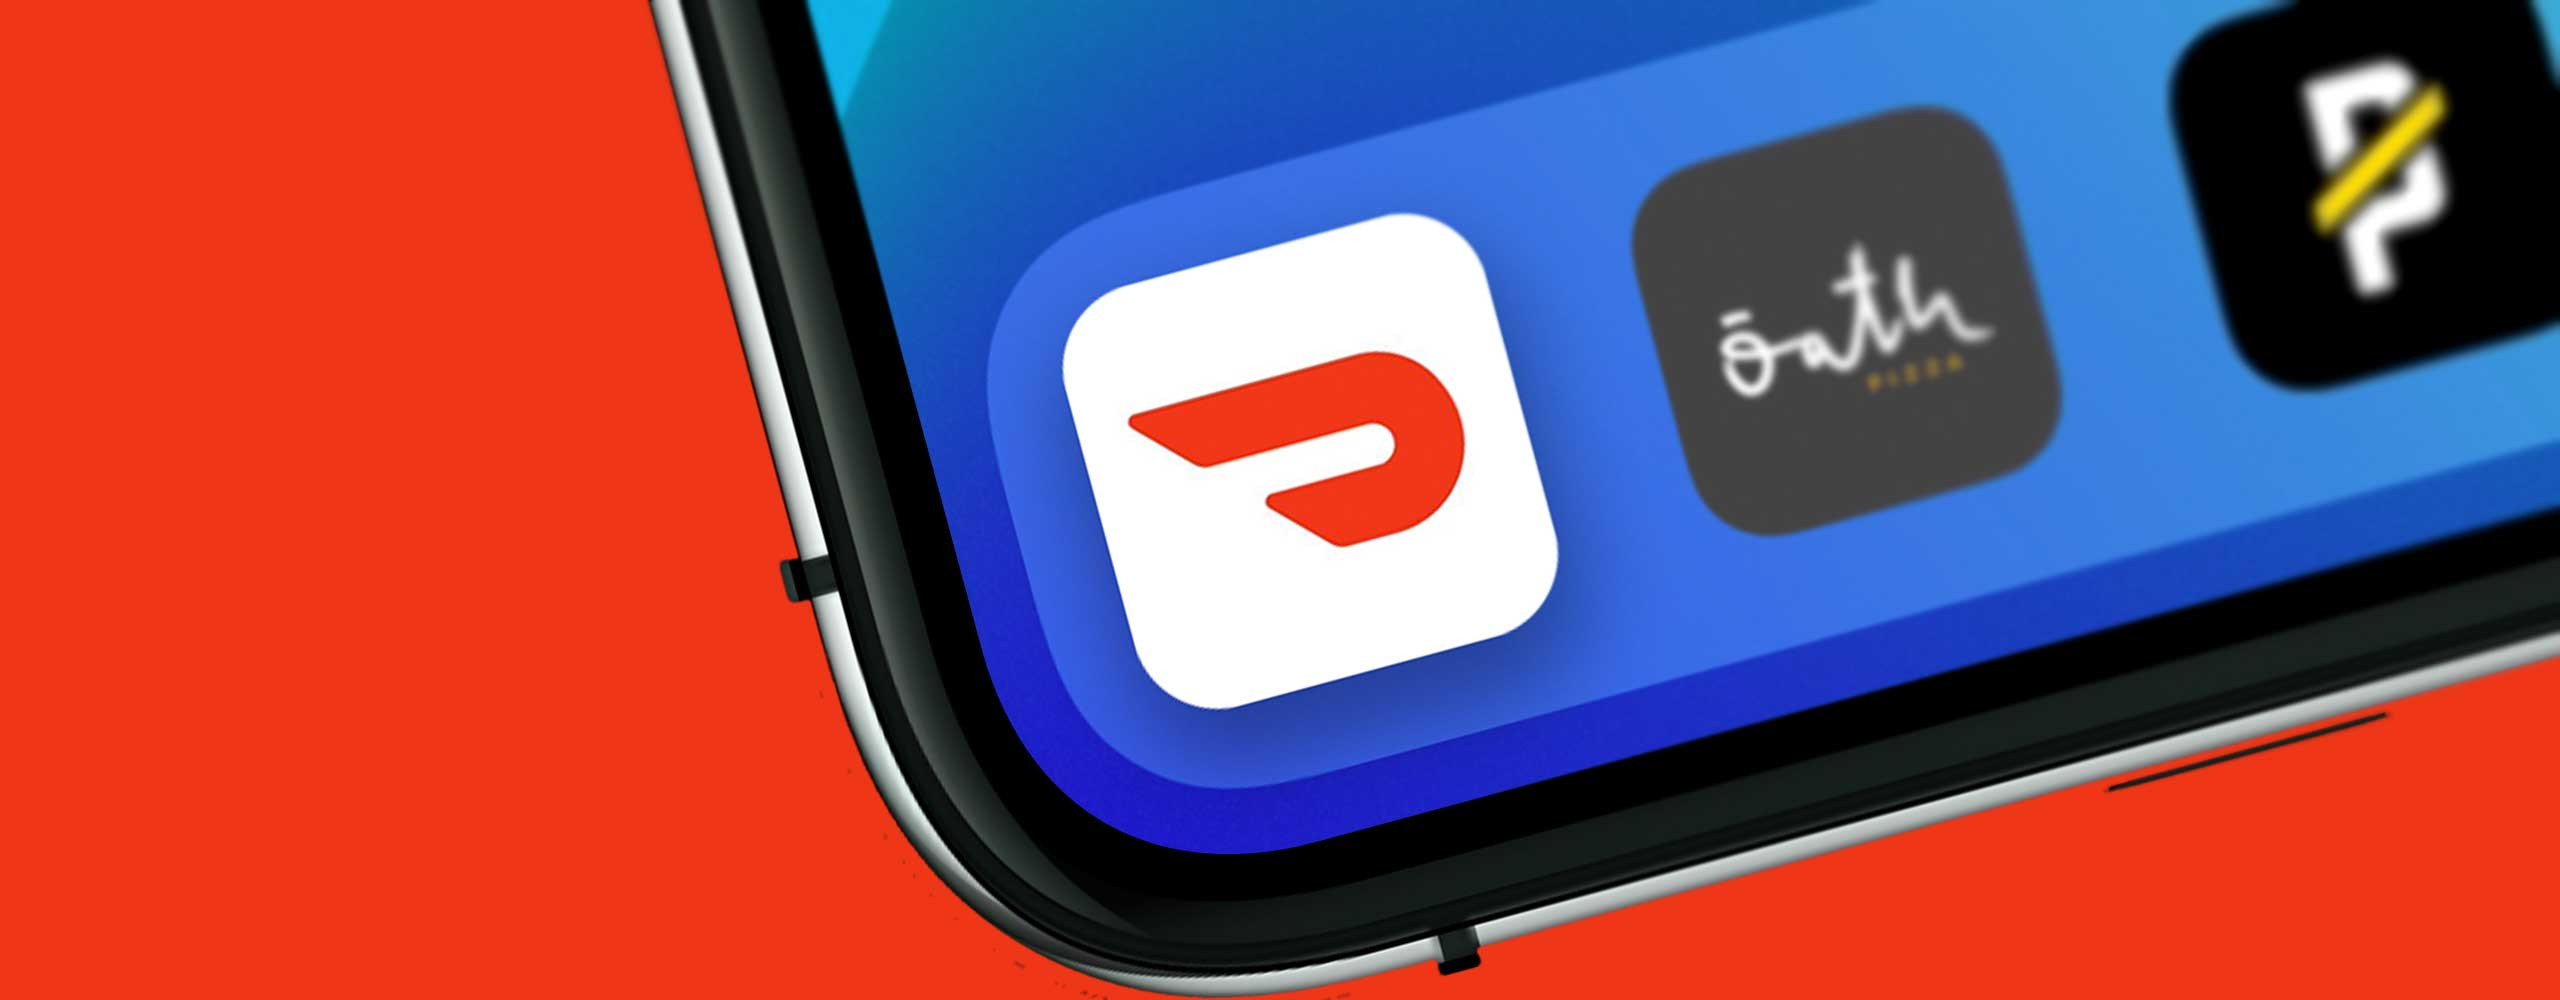 DoorDash app icon on tilted iPhone screen